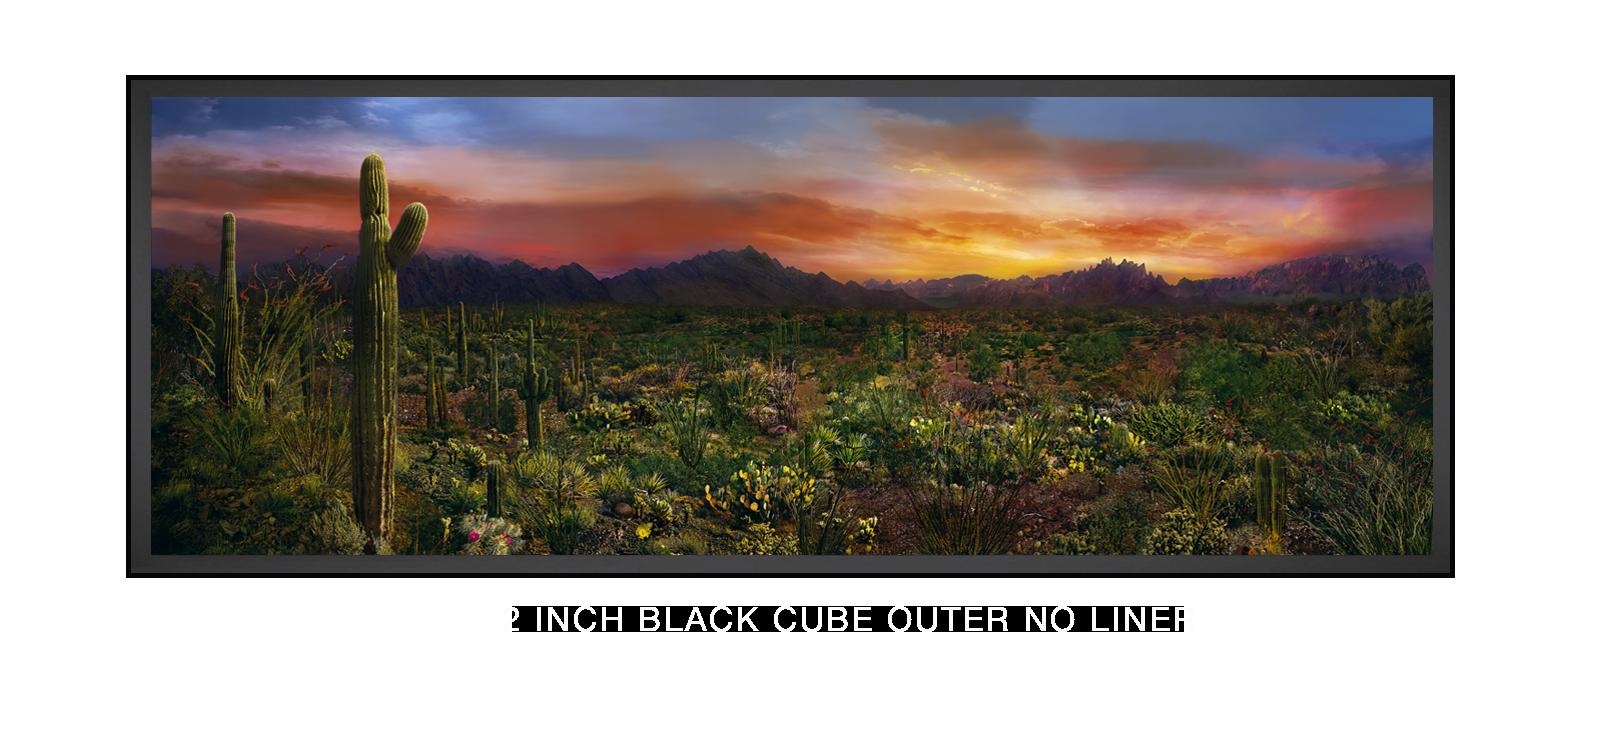 10EDEN VERNALIS 2 Inch Black Cube Outer w_No Liner T